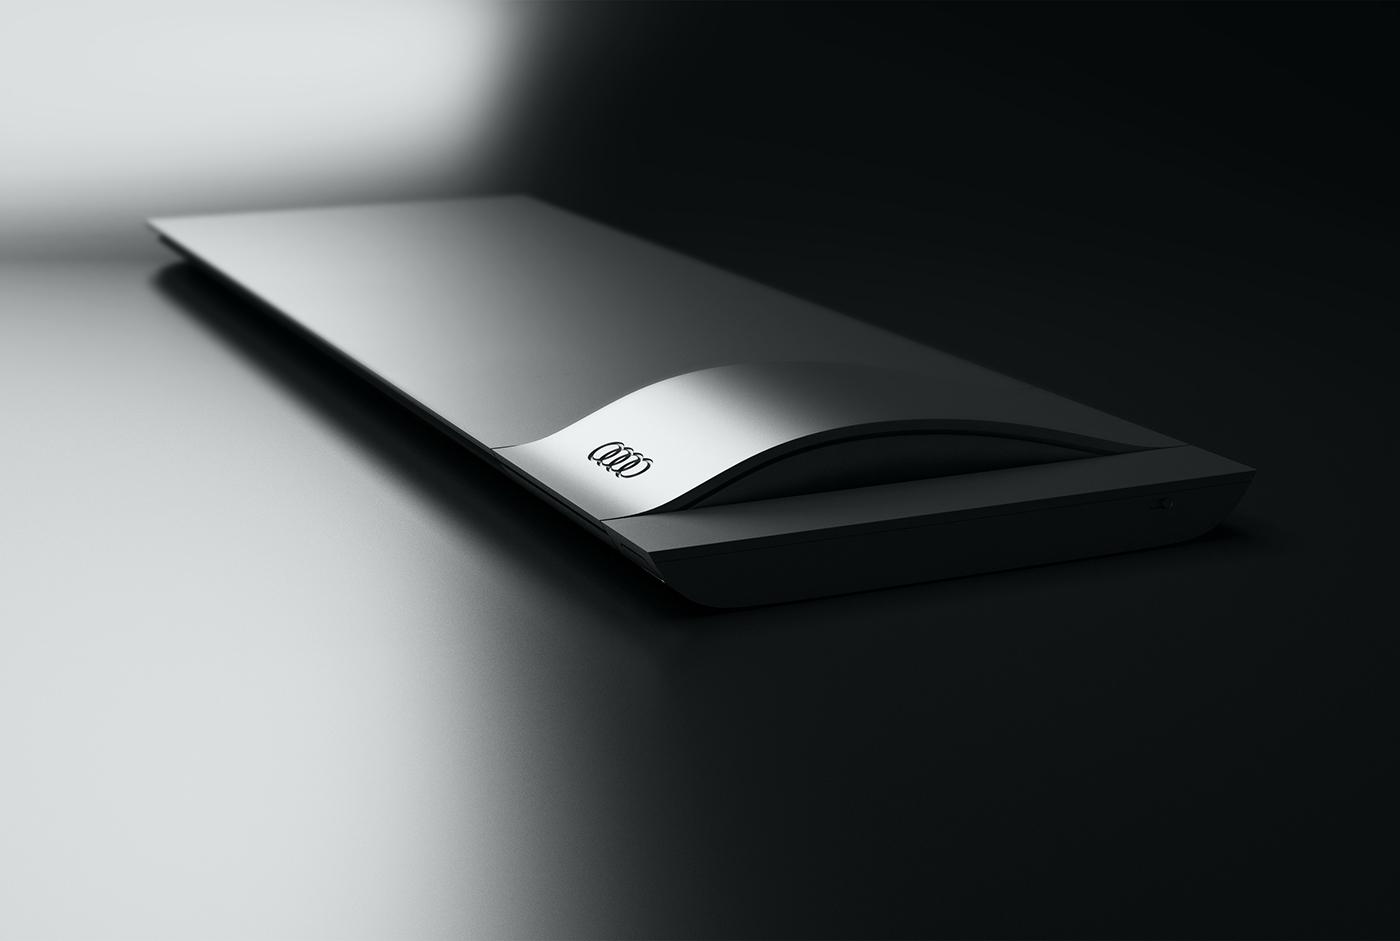 Audi Office desktop wireless bluetooth keyboard mouse tablet trackpad touchpen module modern aluminium layer car